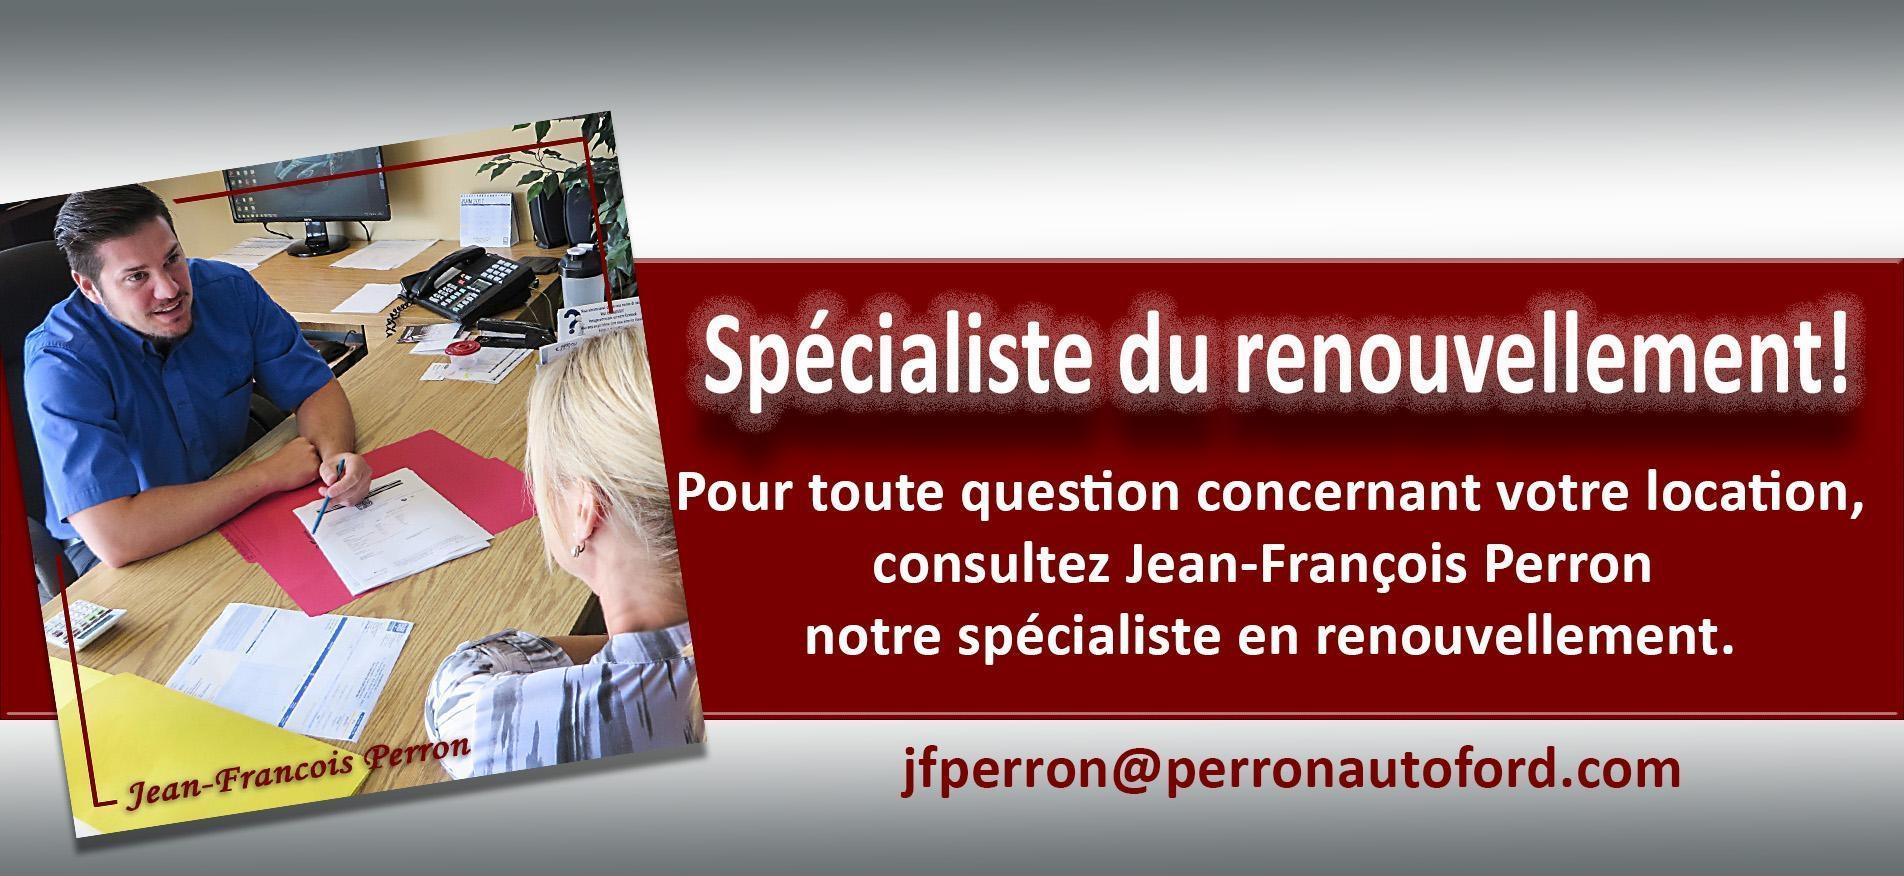 Jean-Francois